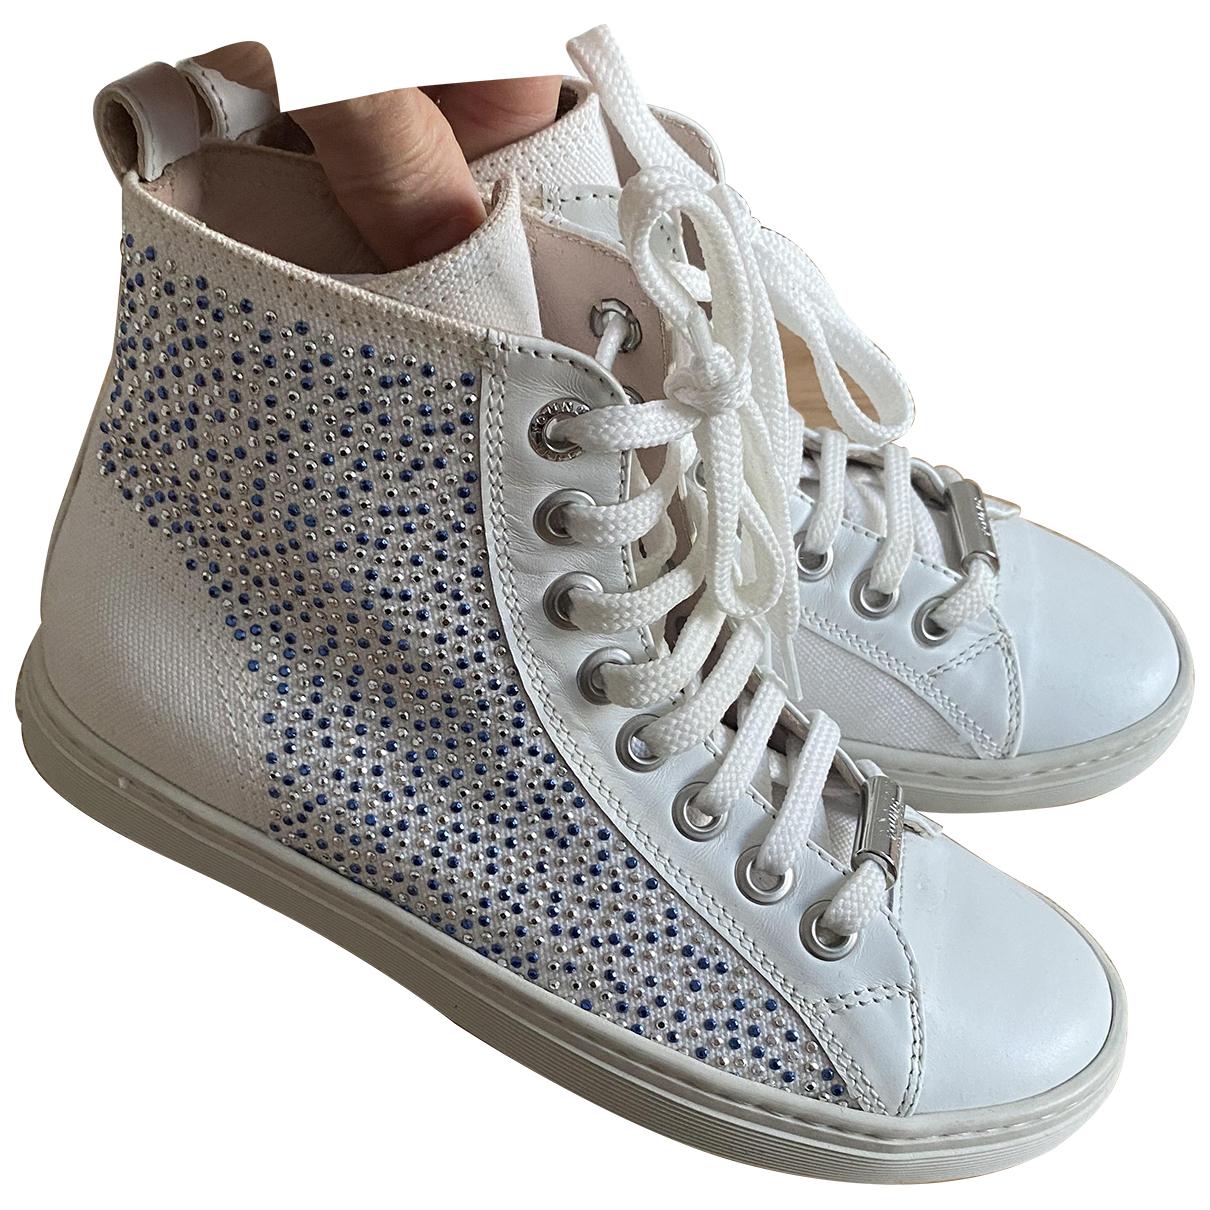 Versace \N Sneakers in  Weiss Leinen